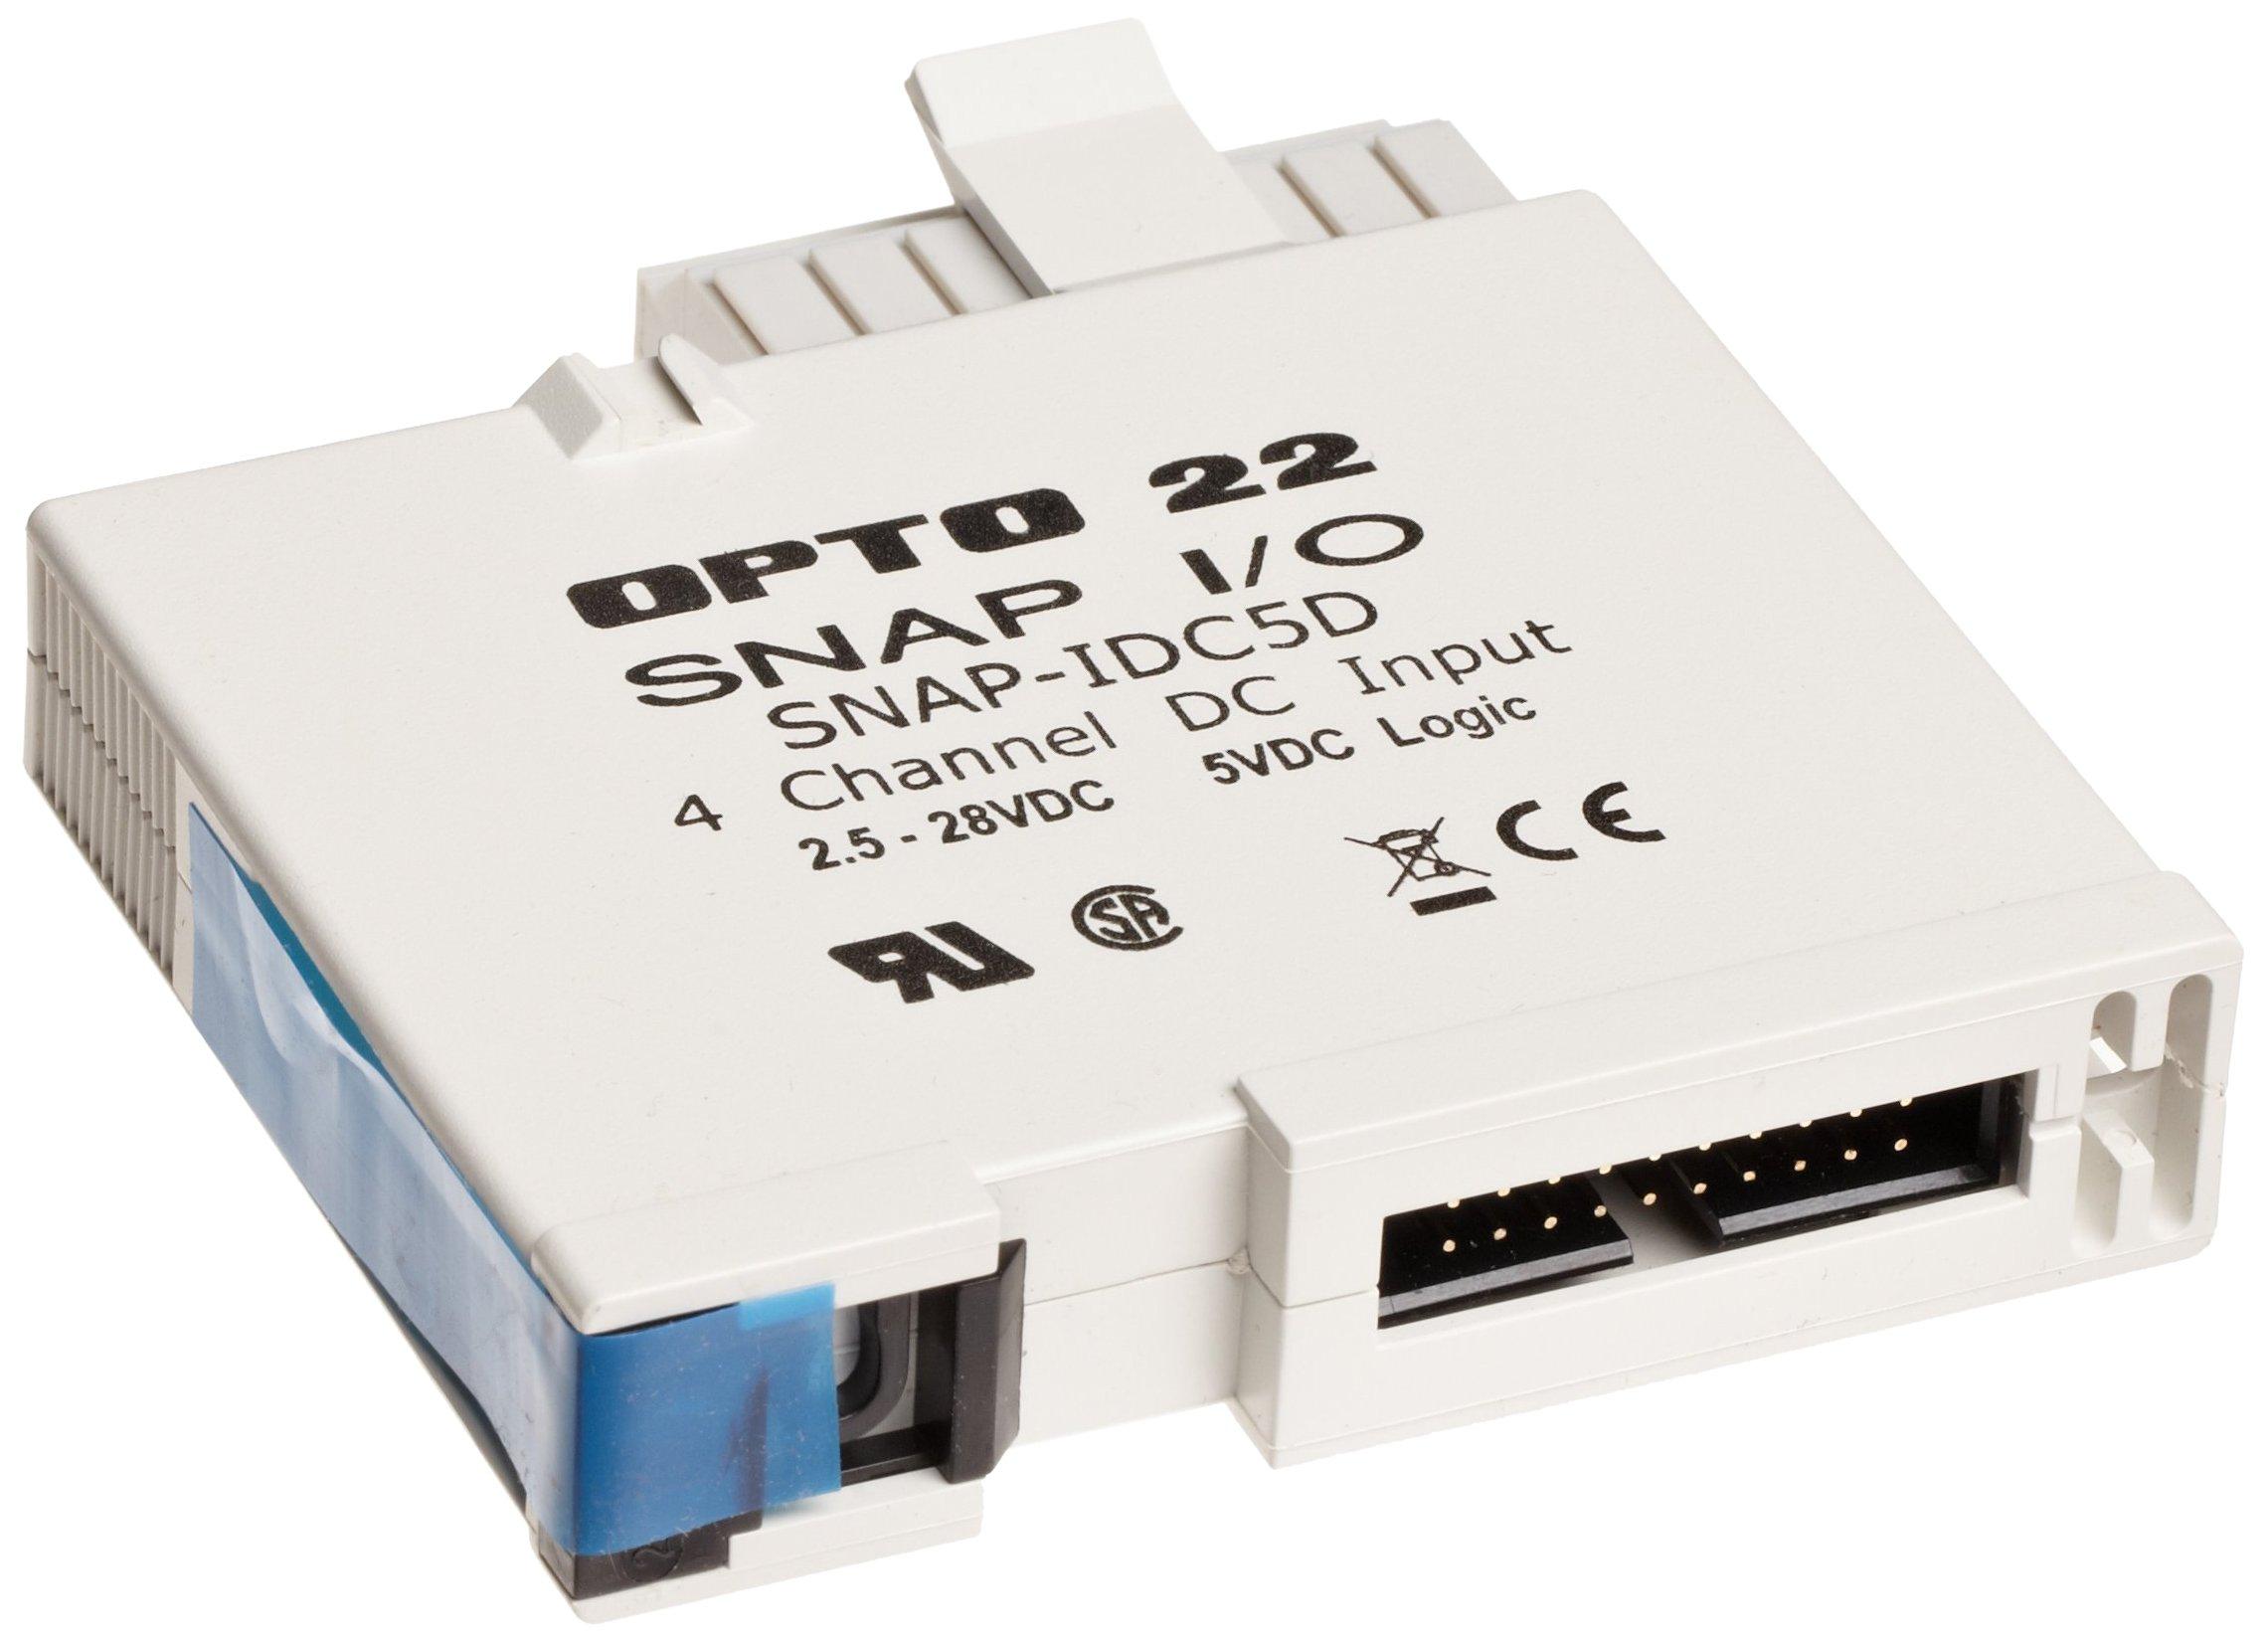 Opto 22 SNAP-IDC5D - SNAP Digital (Discrete) Input Module, 4-Channel, 2.5-28 VDC/VAC